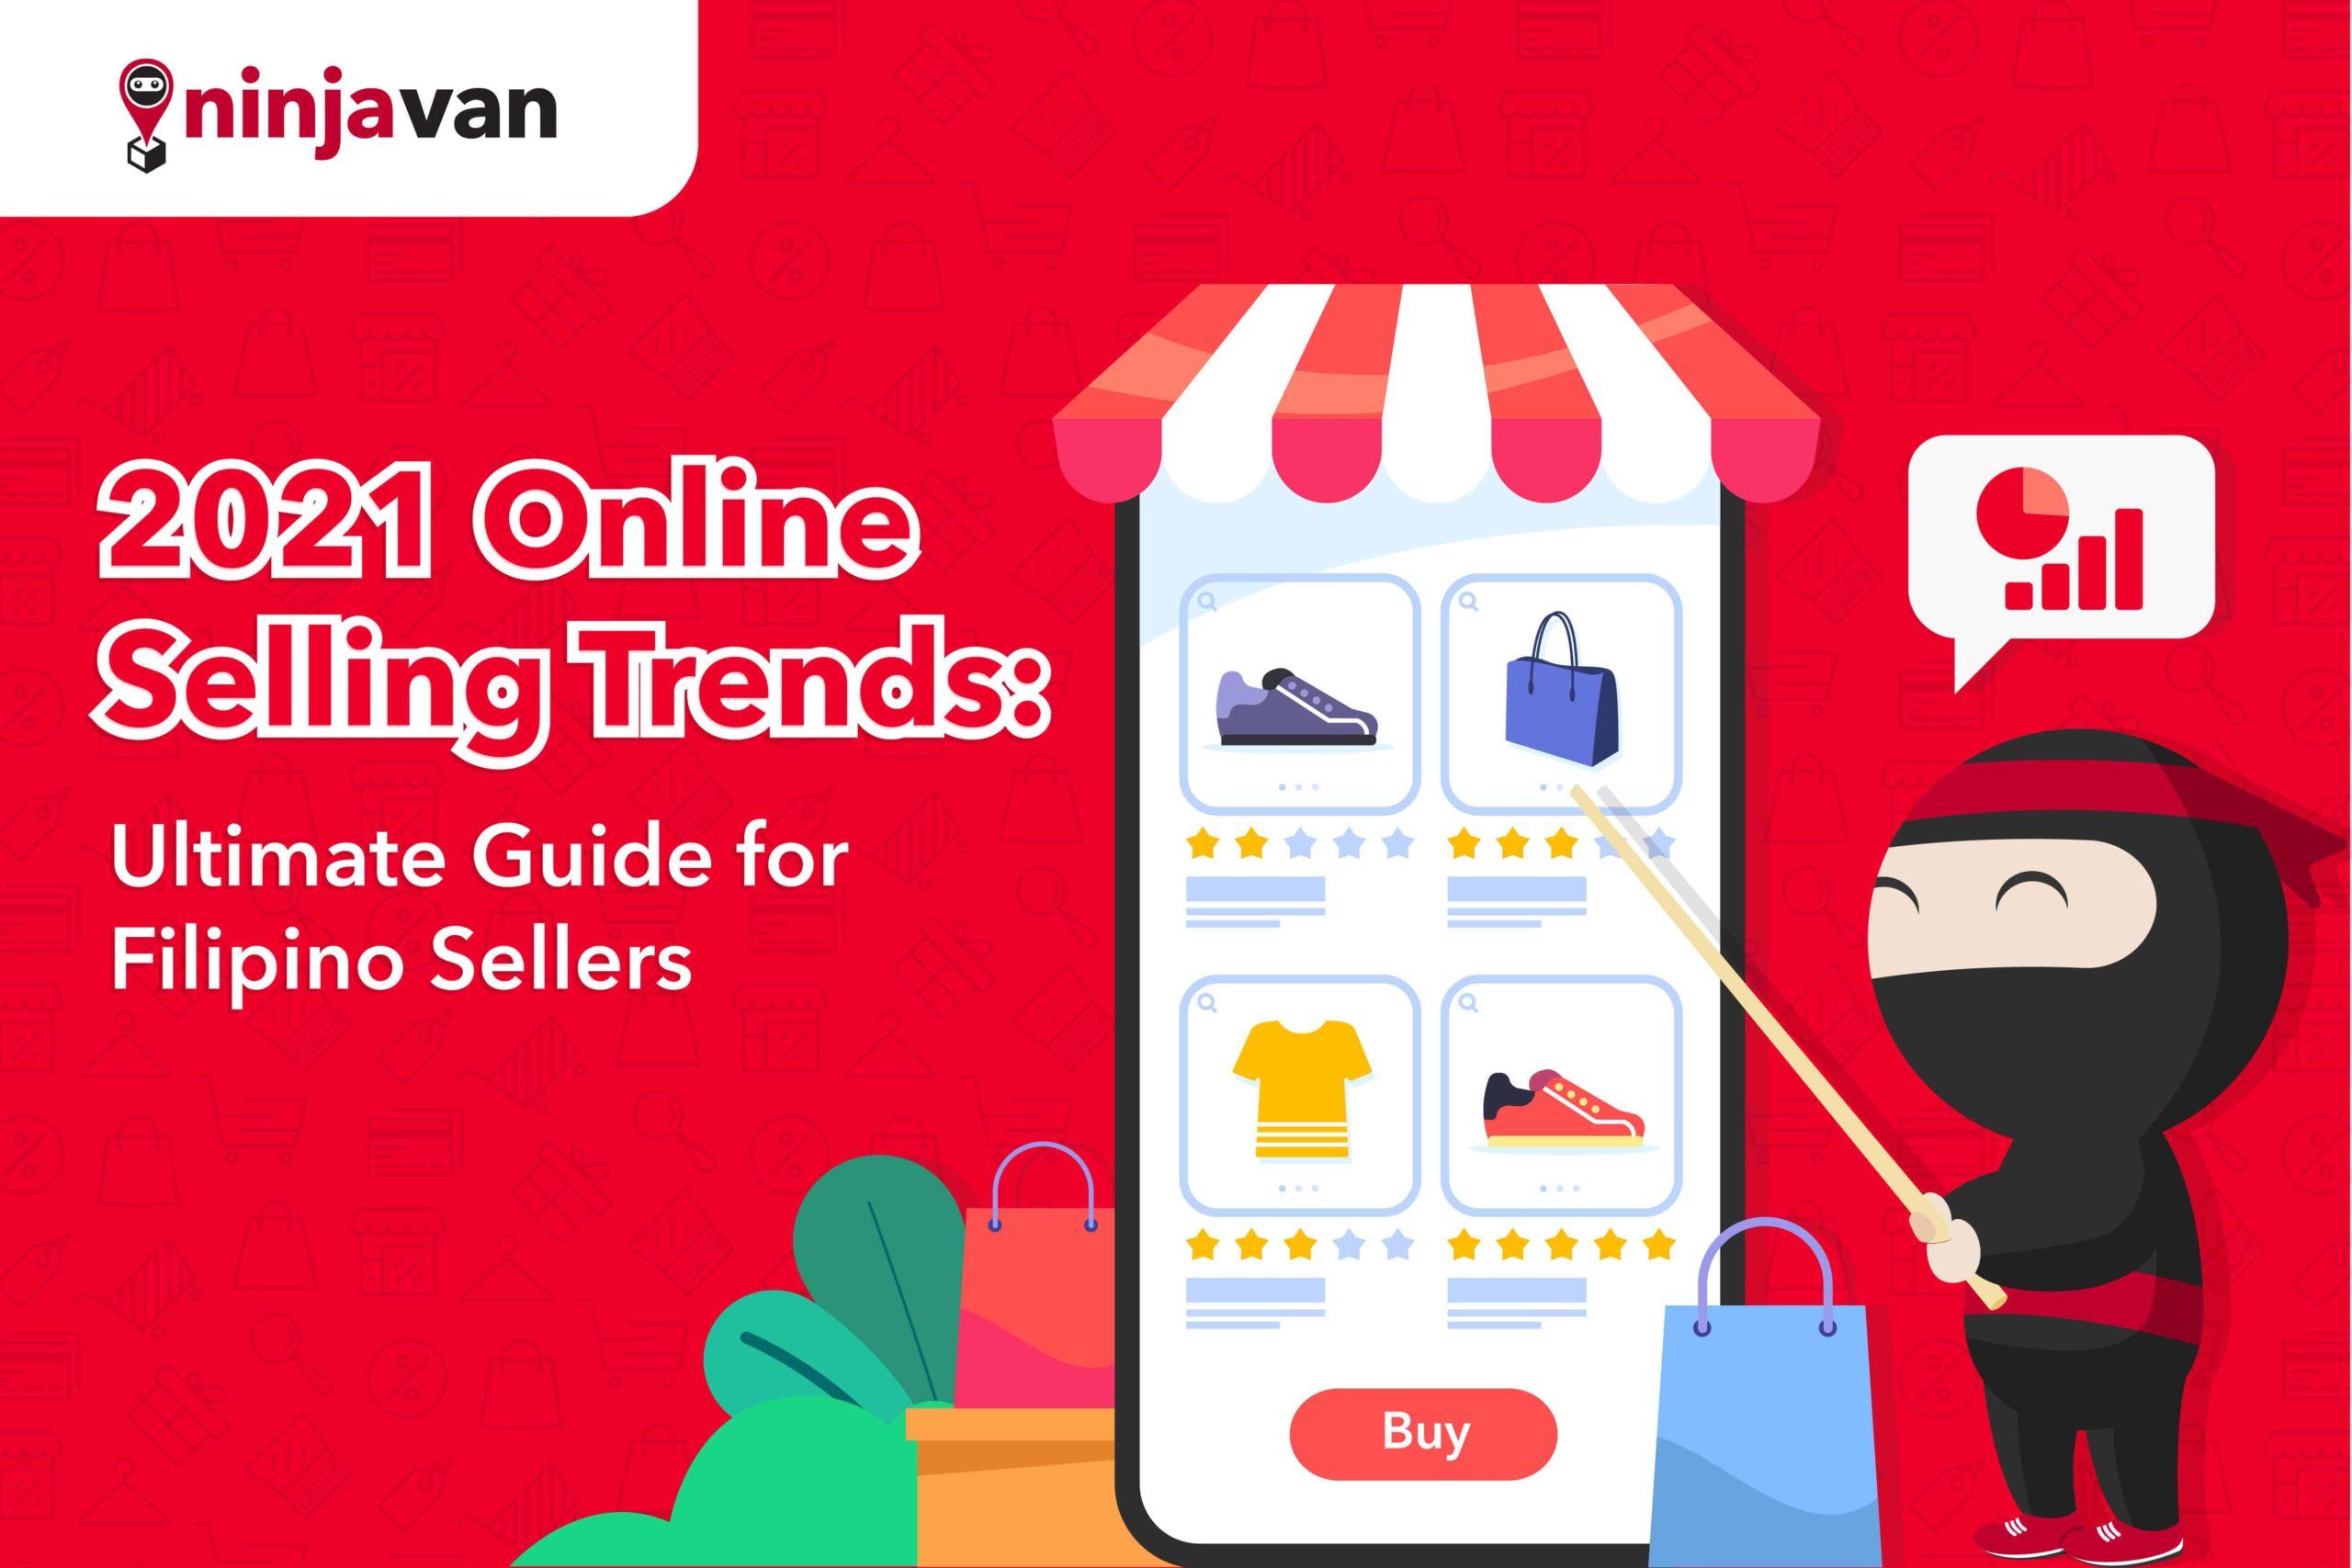 Ninja Van 2021 Online Selling Trends for Filipino eCommerce sellers